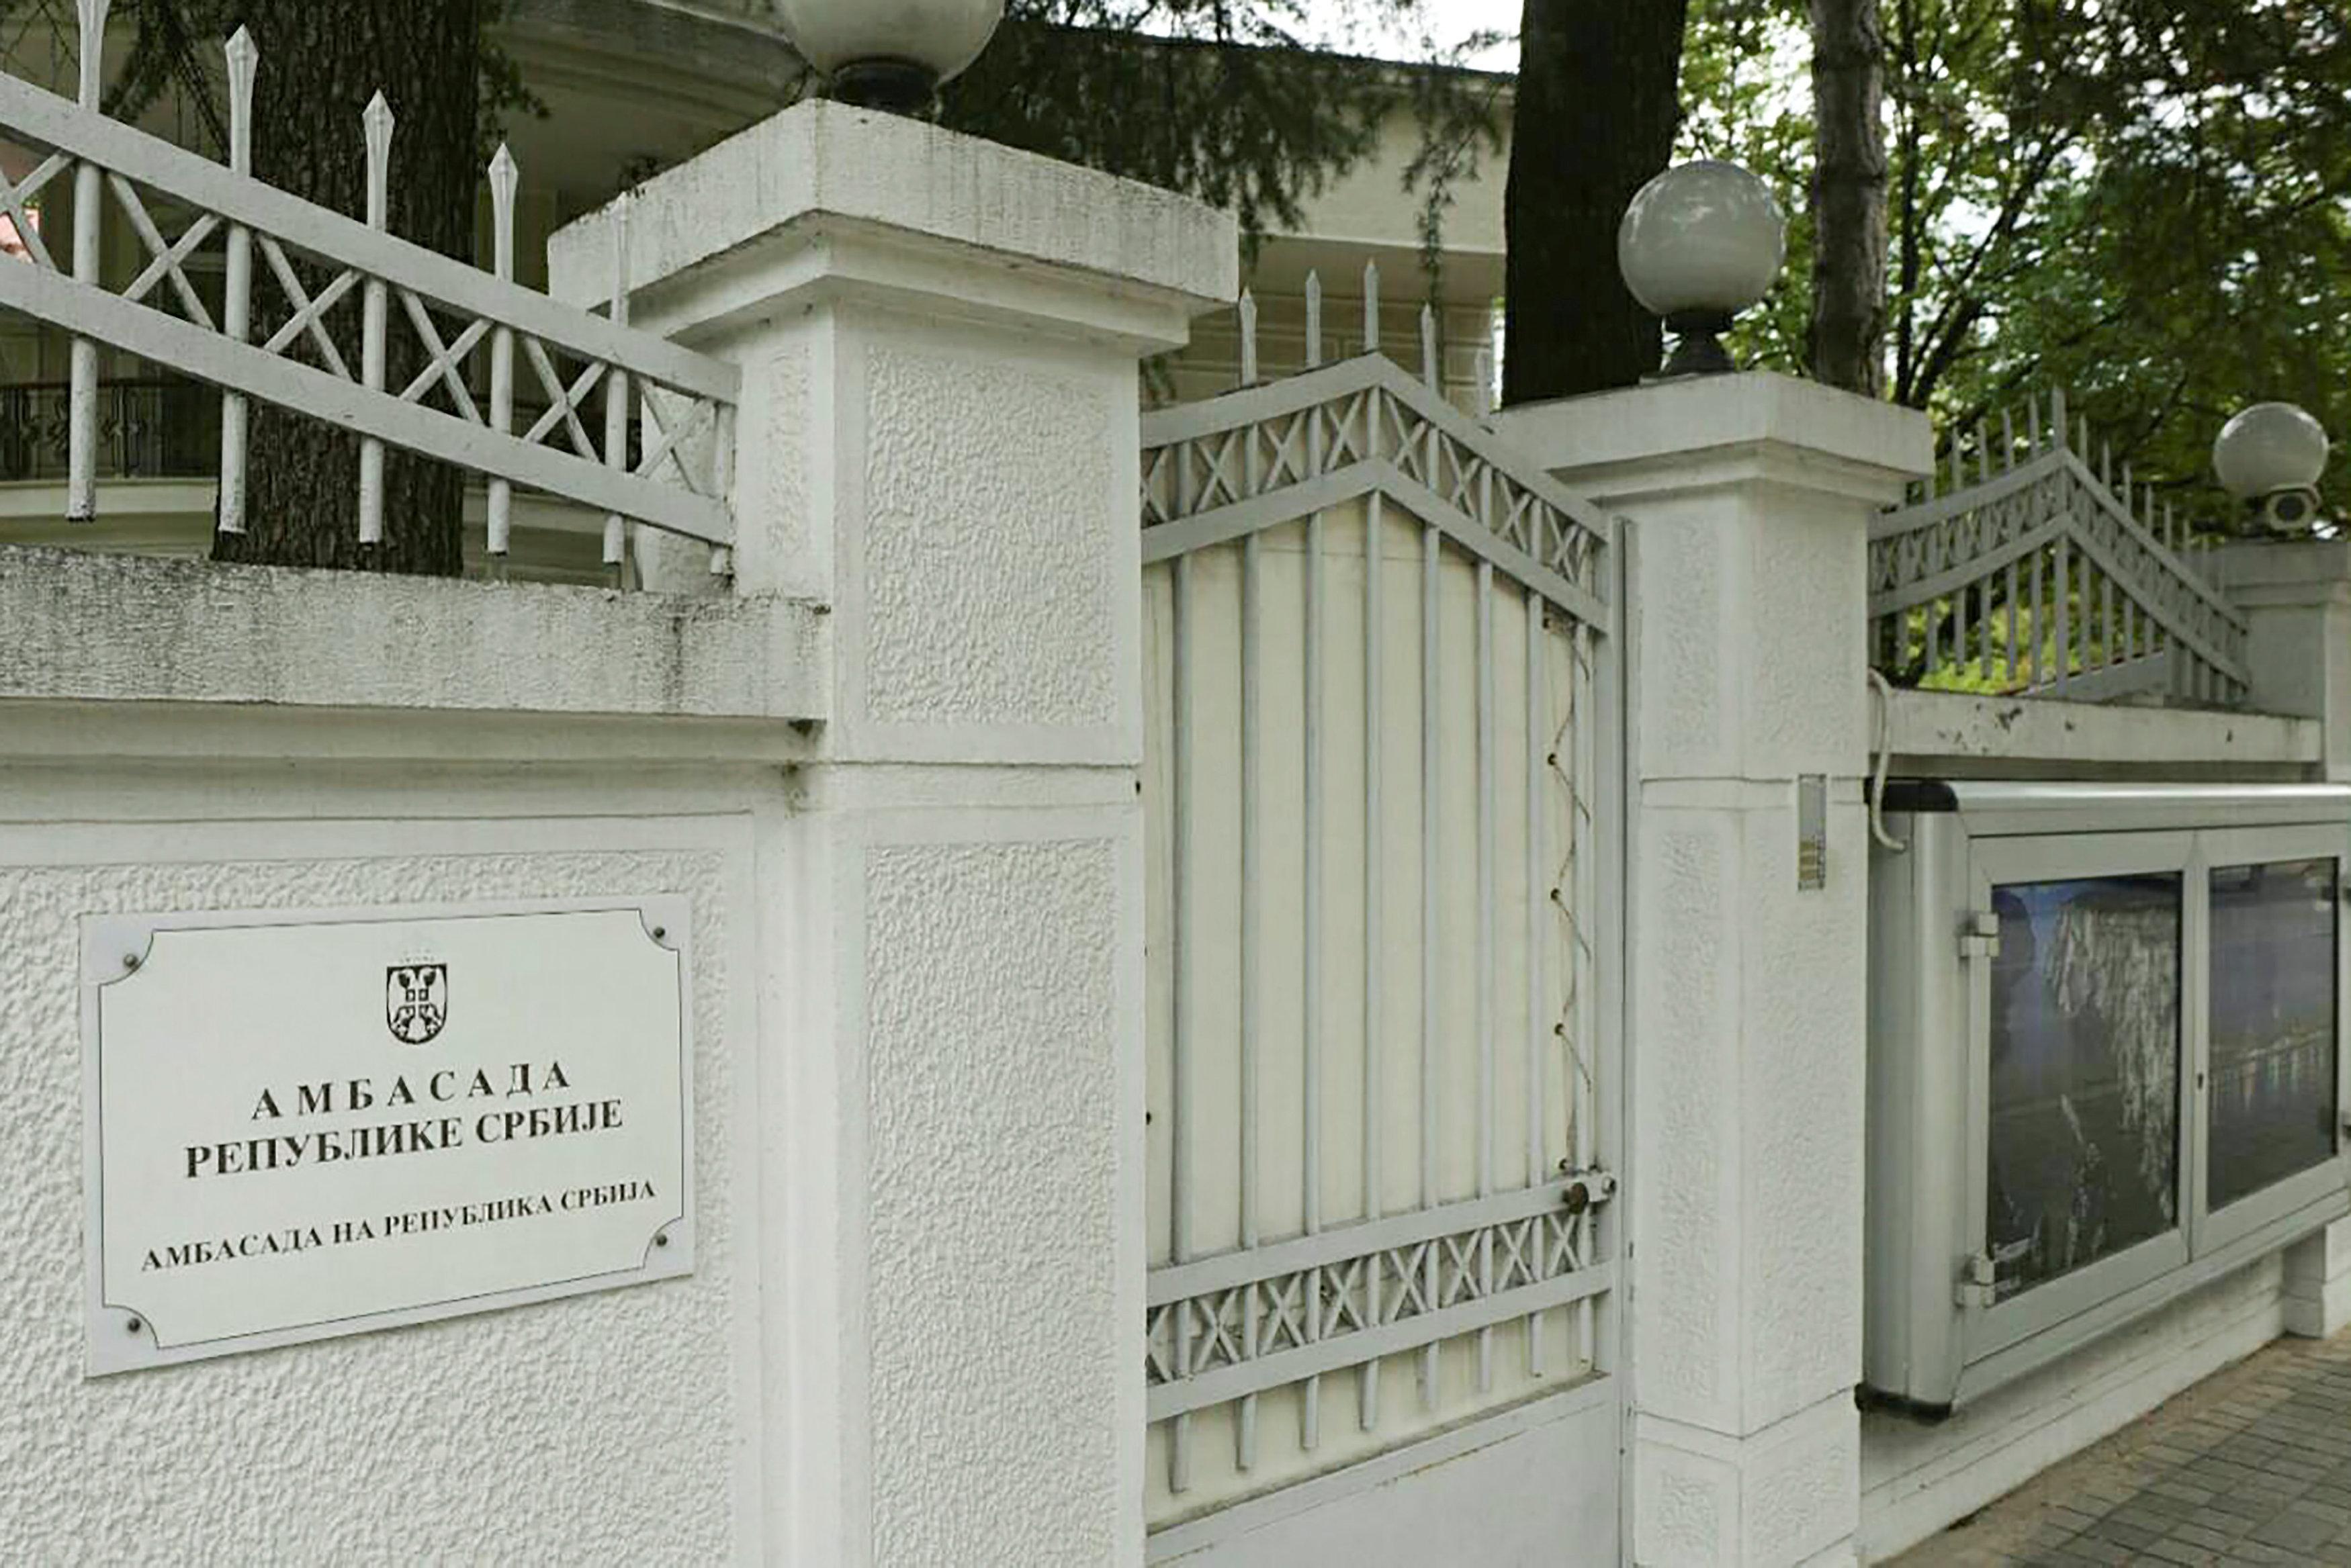 Serbia recalls embassy staff from Macedonia